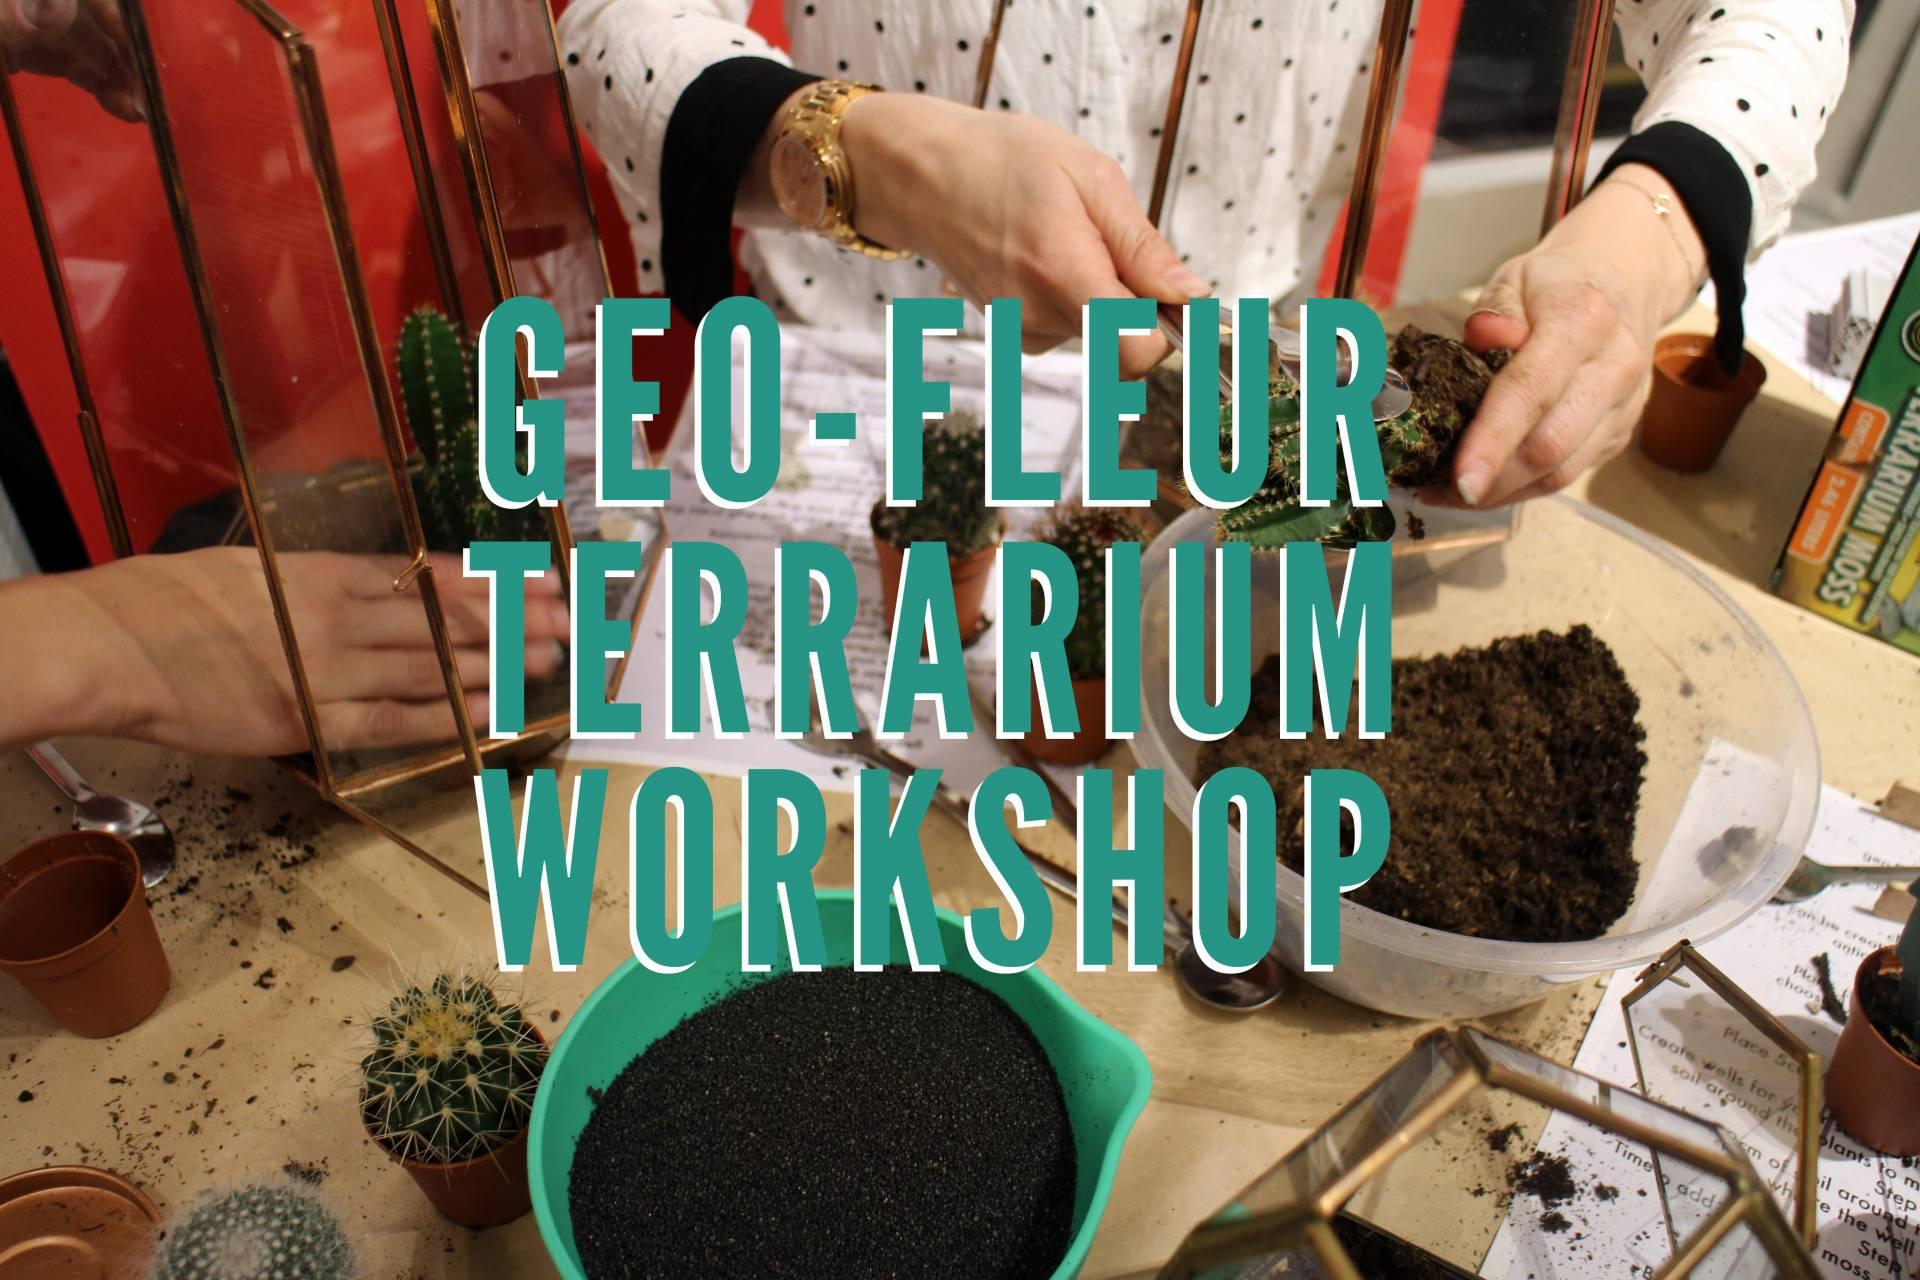 https://graphiquefantastique.com/wp-content/uploads/2015/10/Geo-Fleur-Terrarium-Workshop.jpg